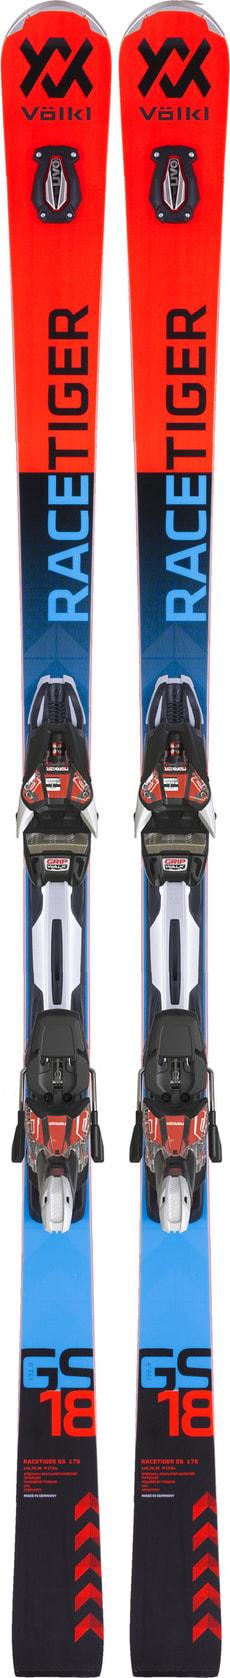 Racetiger GS inkl. rMotion 12.0